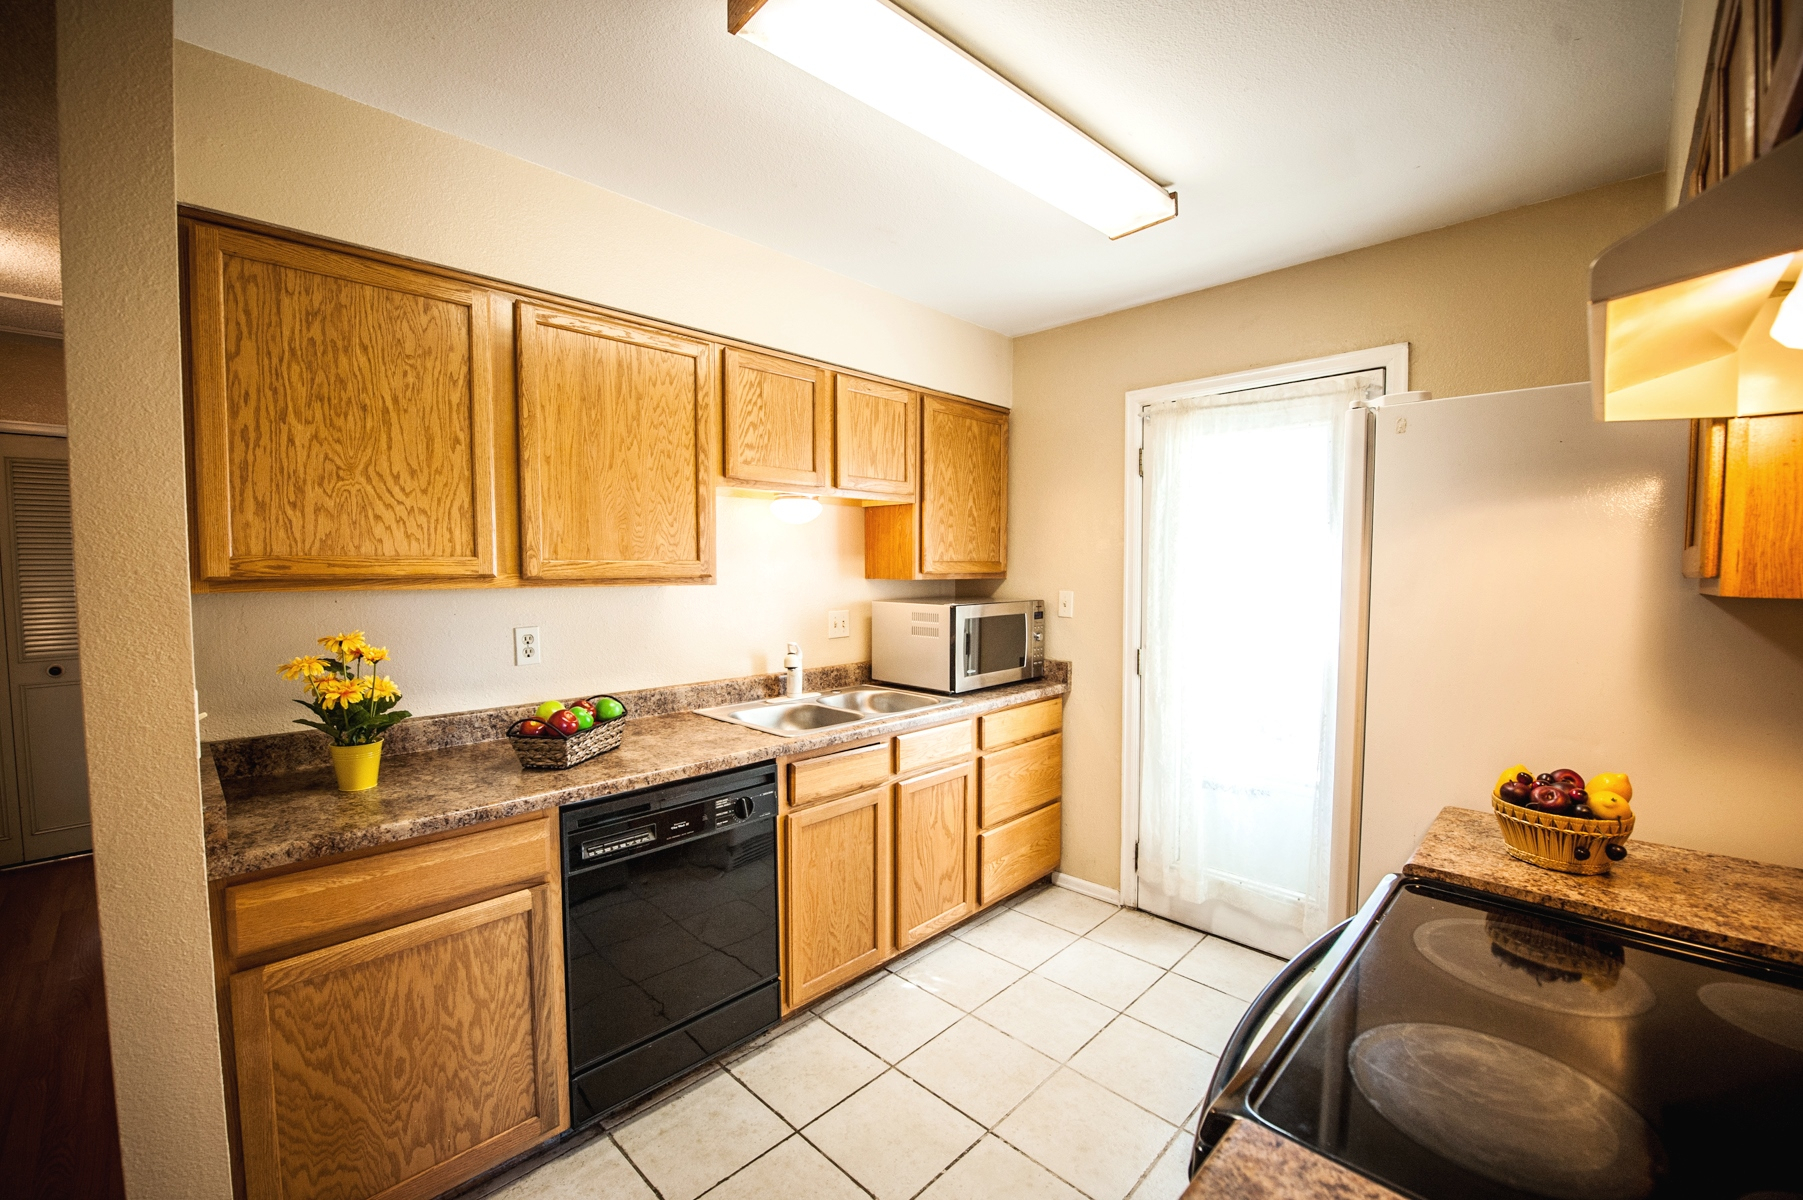 School District 20 Bi-Level   Live Dream Colorado   Sell A in District 20 Colorado Springs